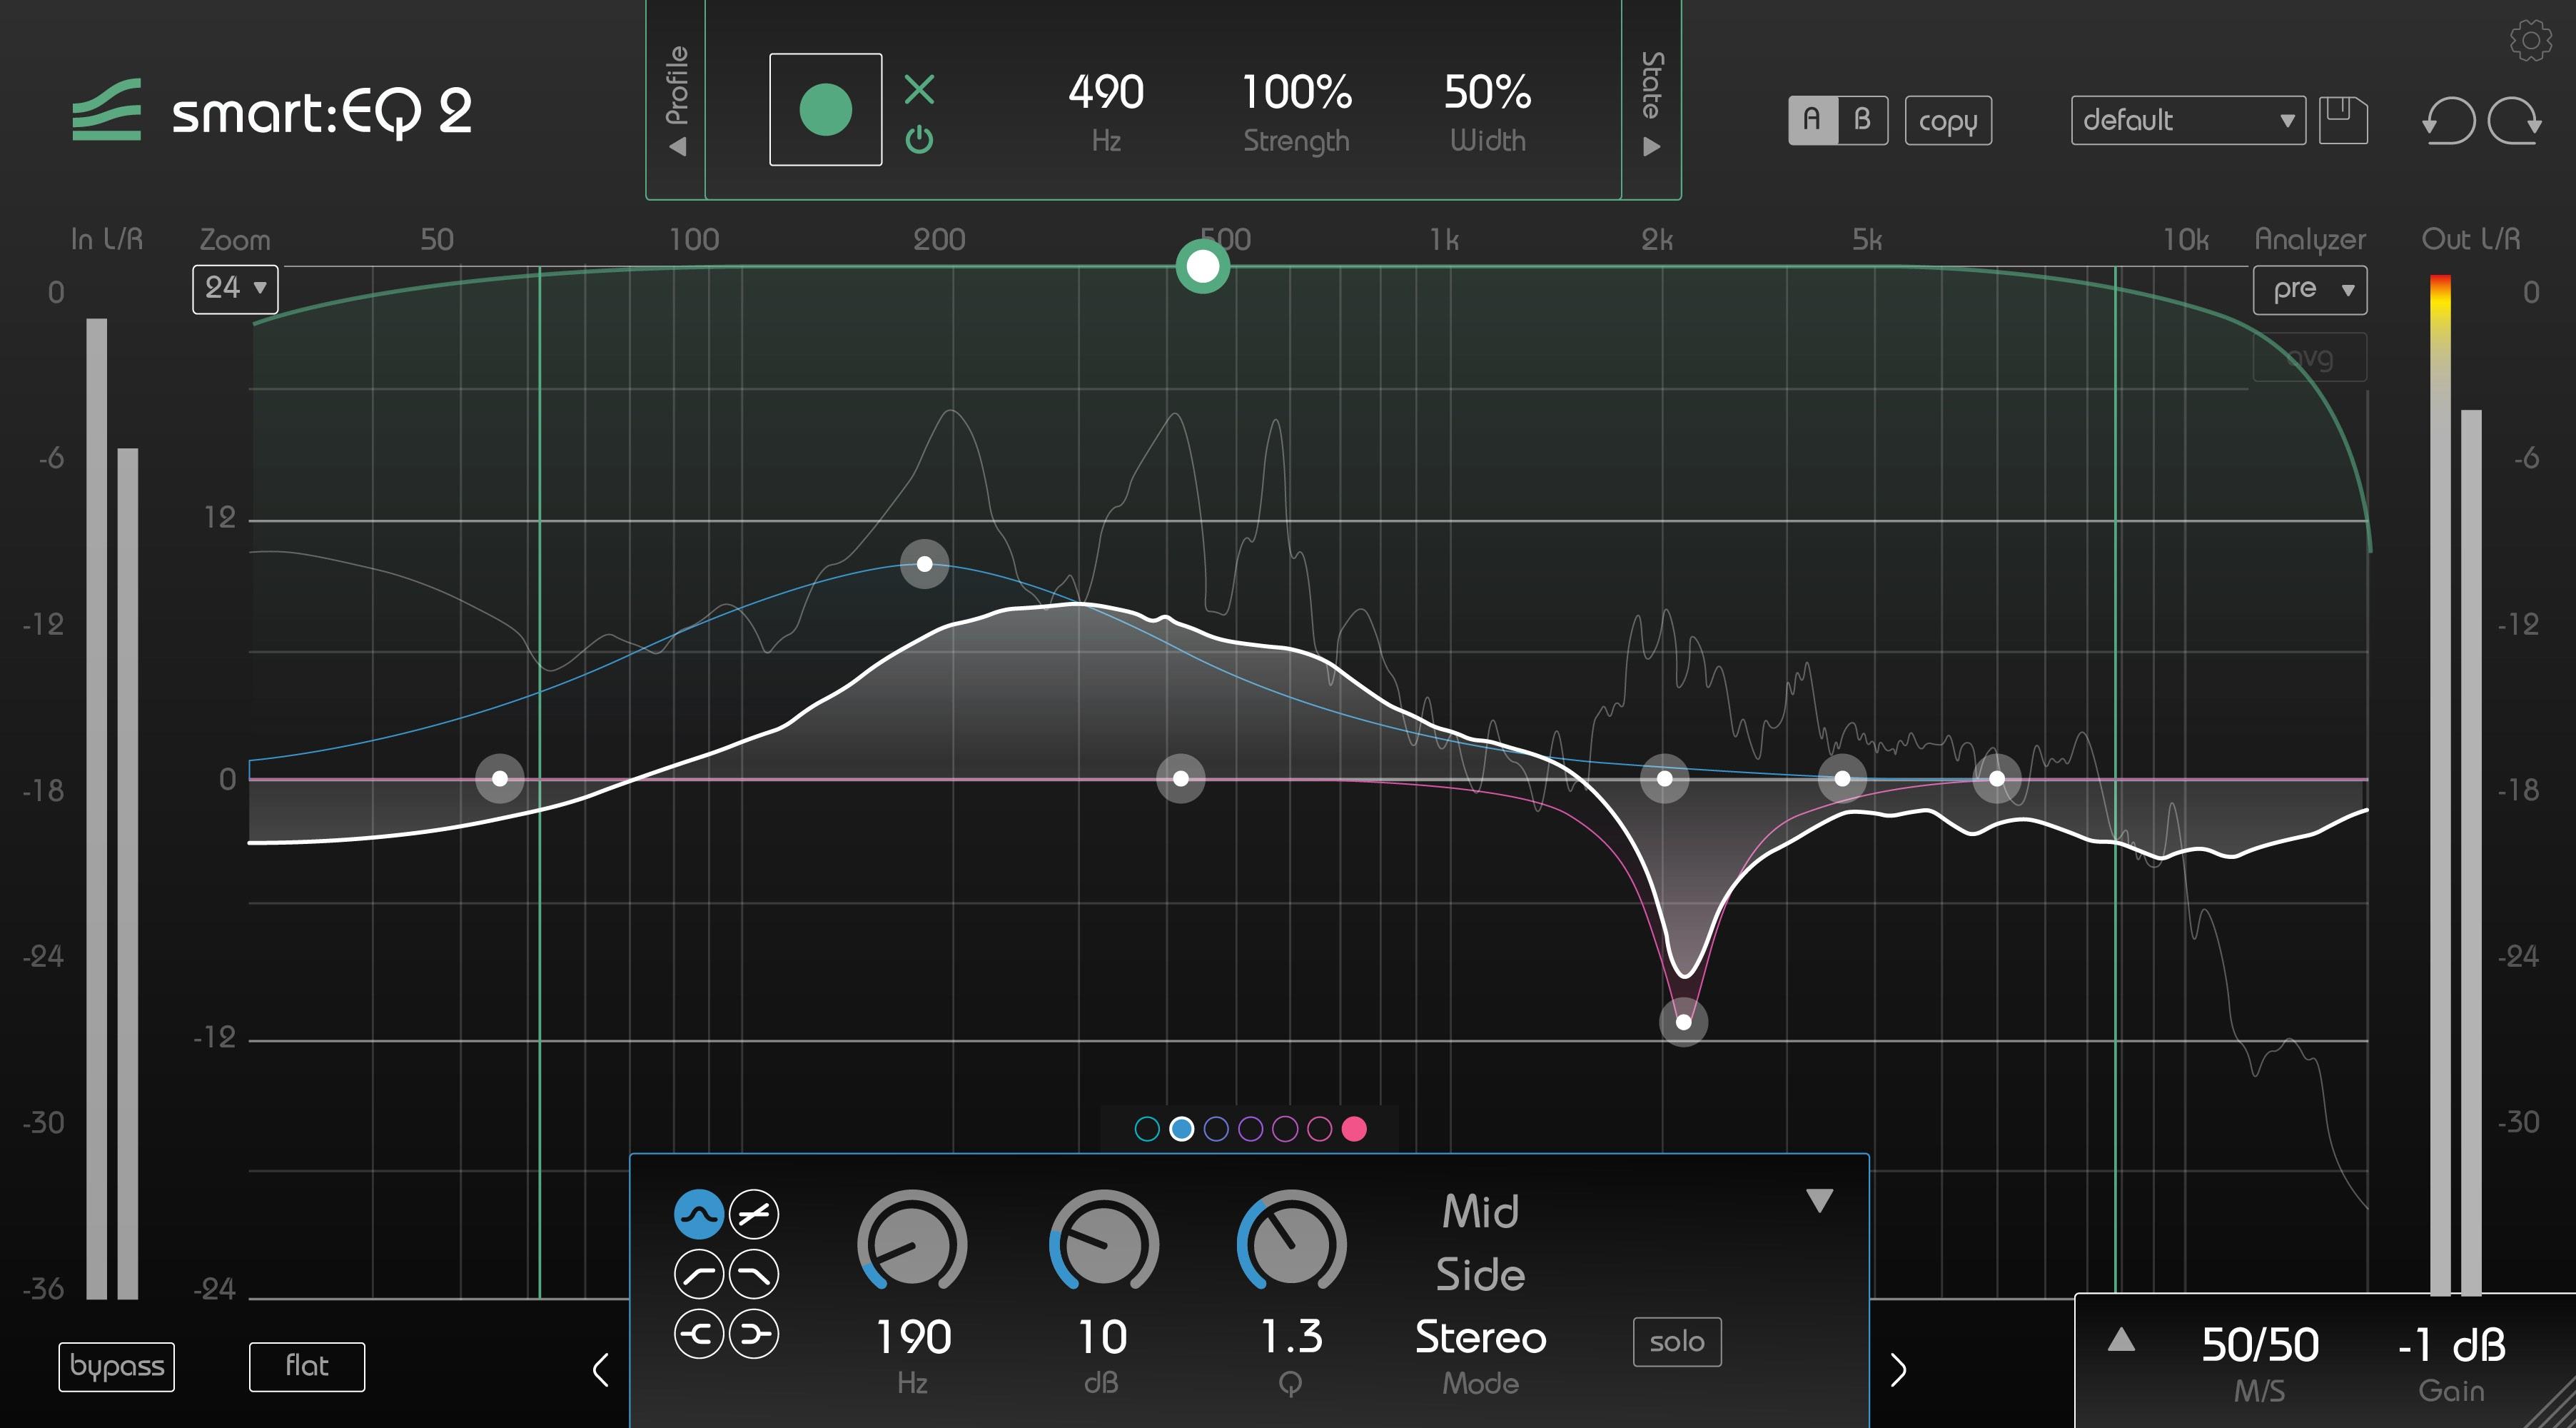 smart:EQ 2 by sonible - Intelligent Equalizer VST Plugin, Audio ...